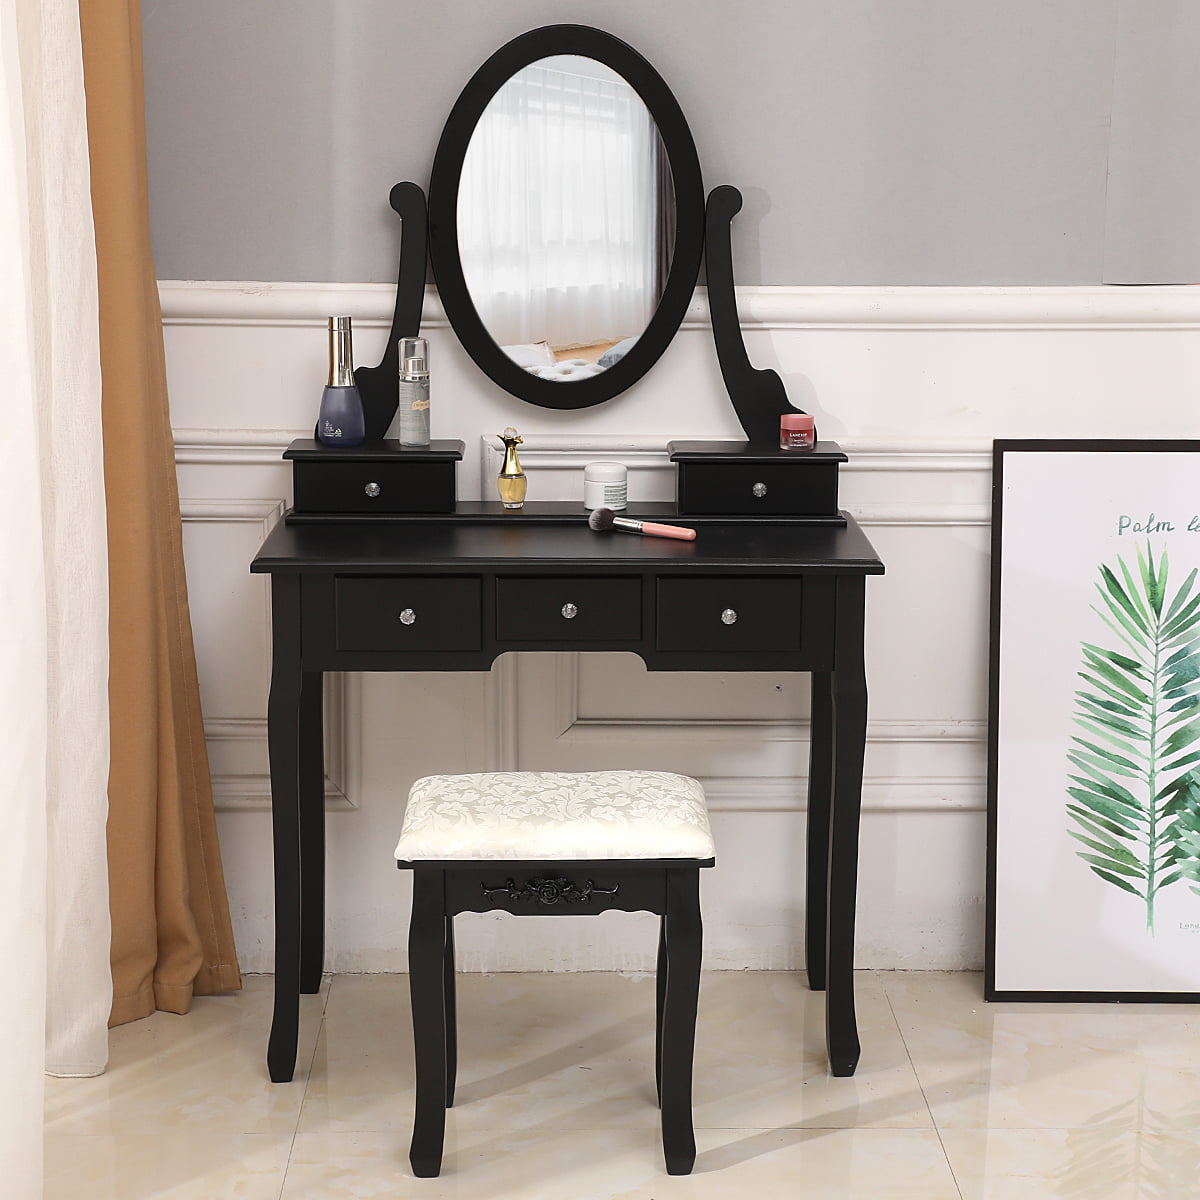 Zimtown Black Vanity Makeup Dressing Table Set W Stool 5 Drawers Mirror Jewelry Desk Walmart Com Walmart Com